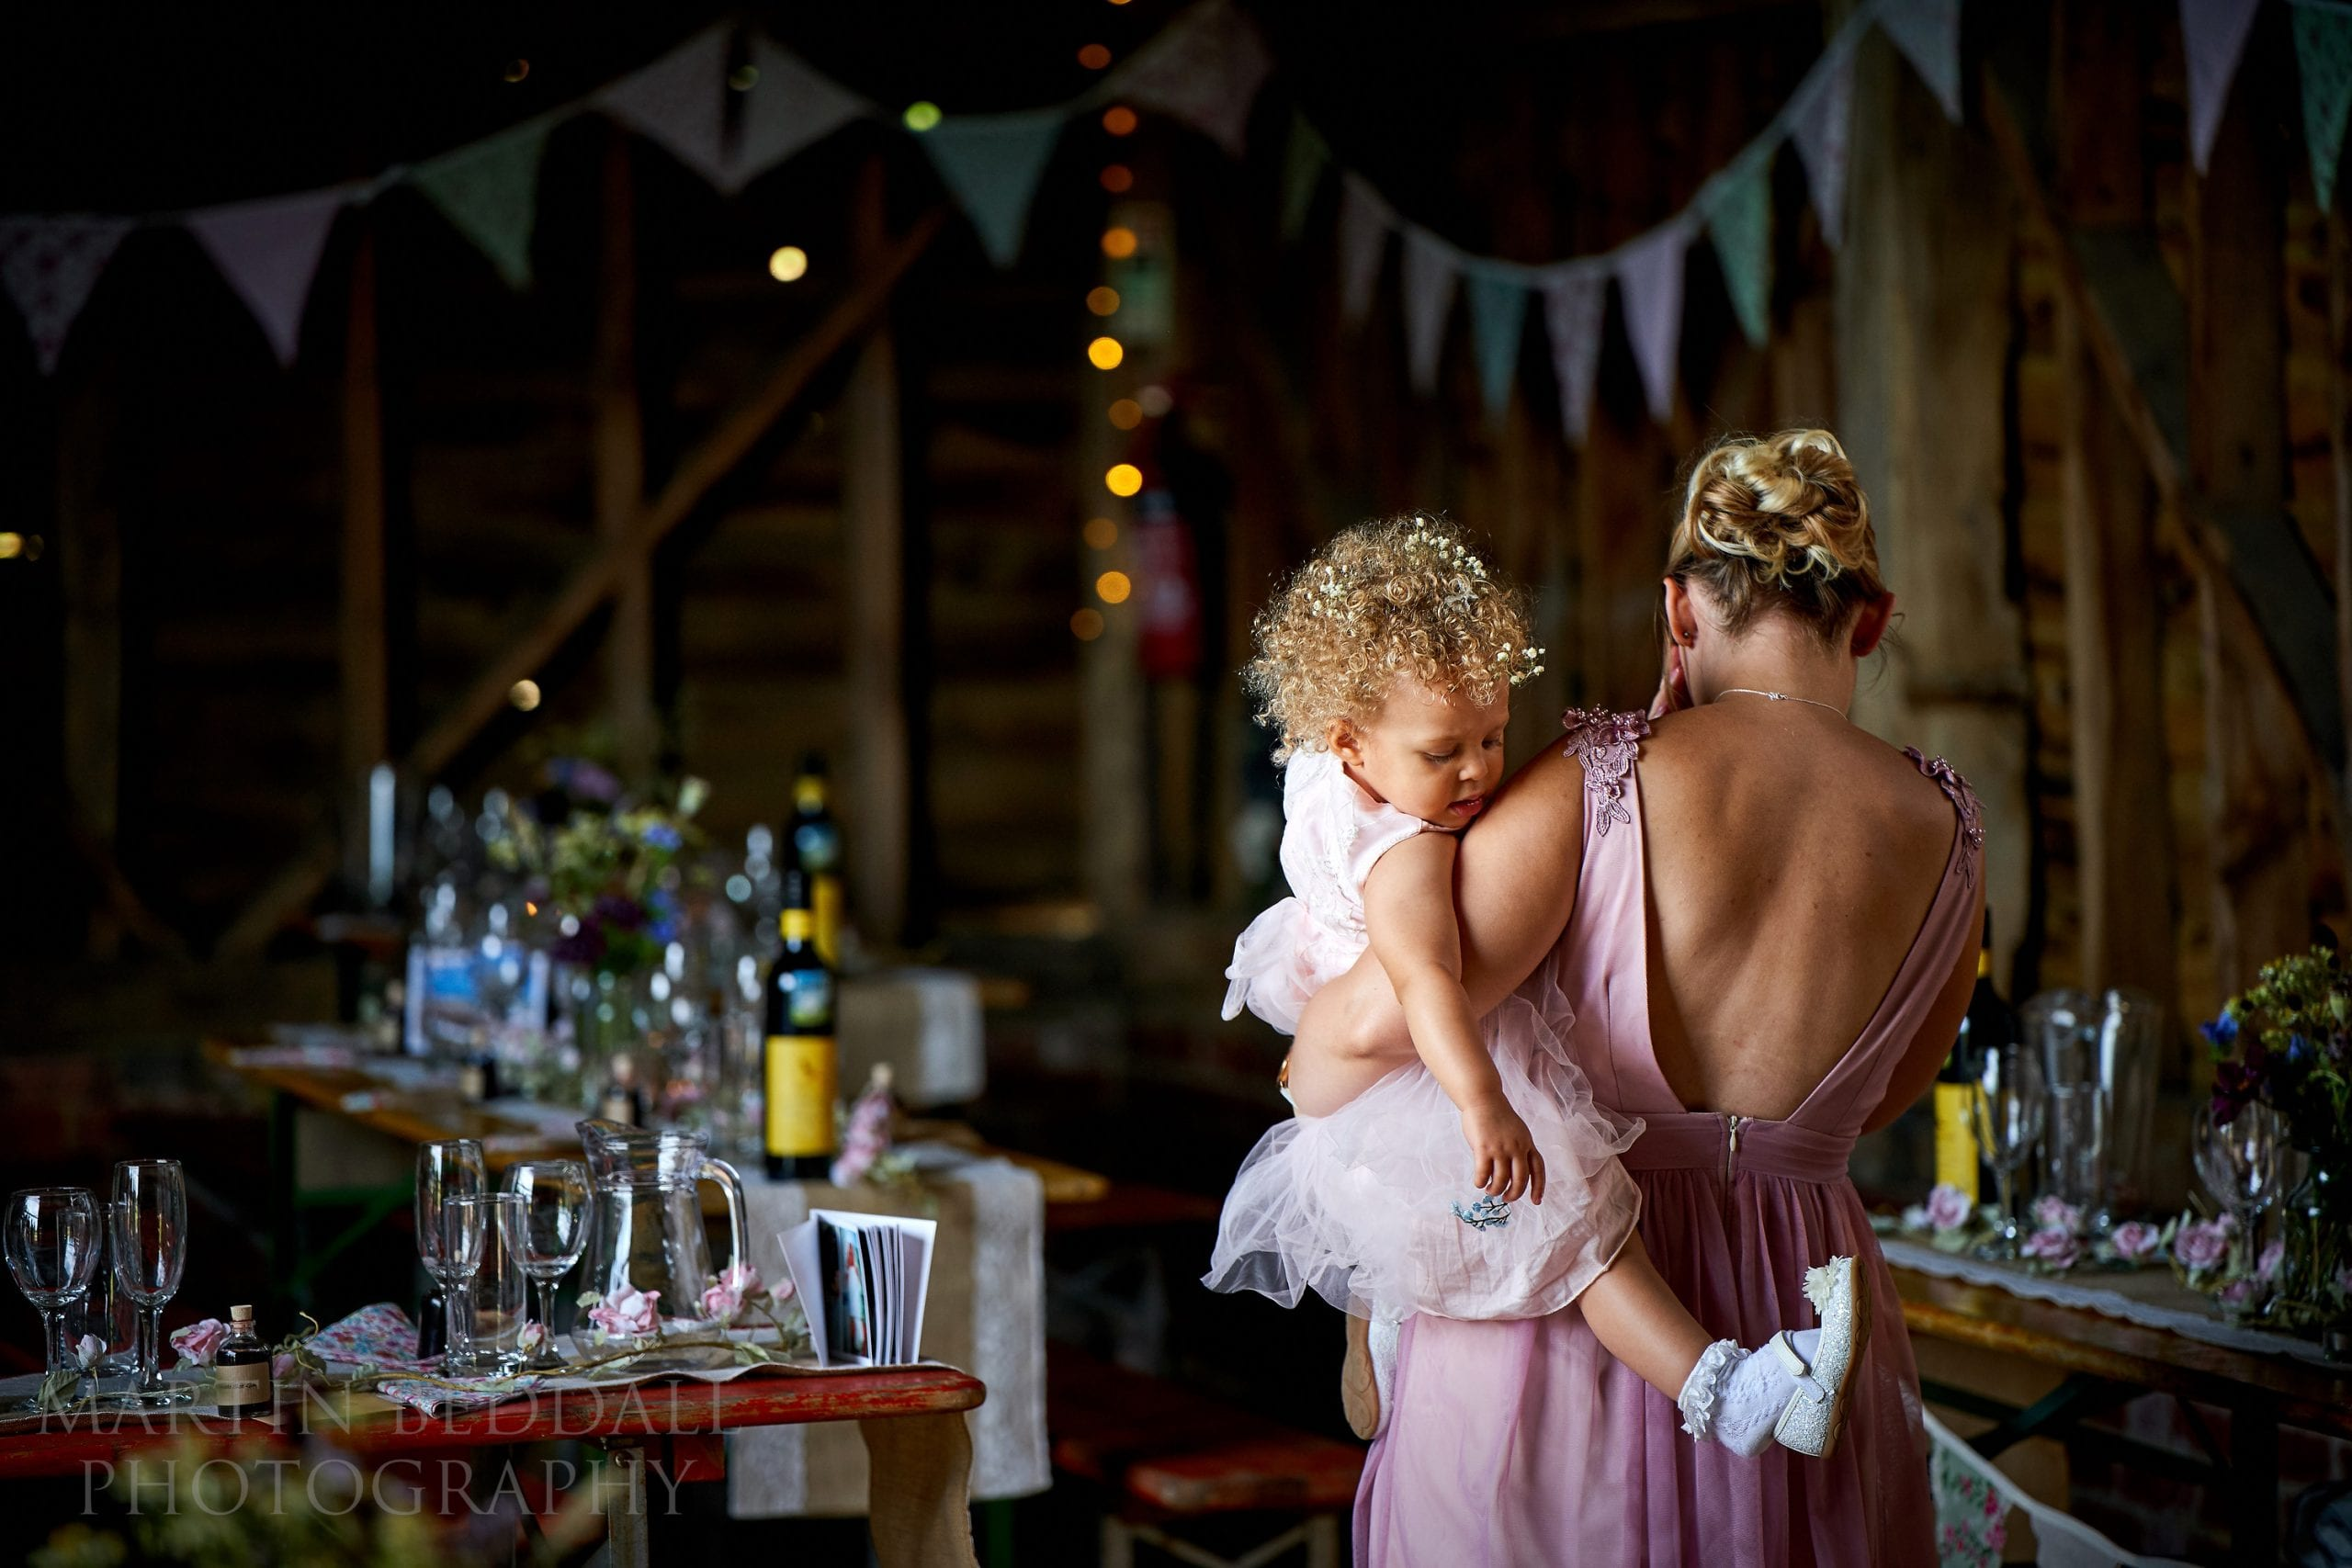 Secret Barn wedding reportage photography